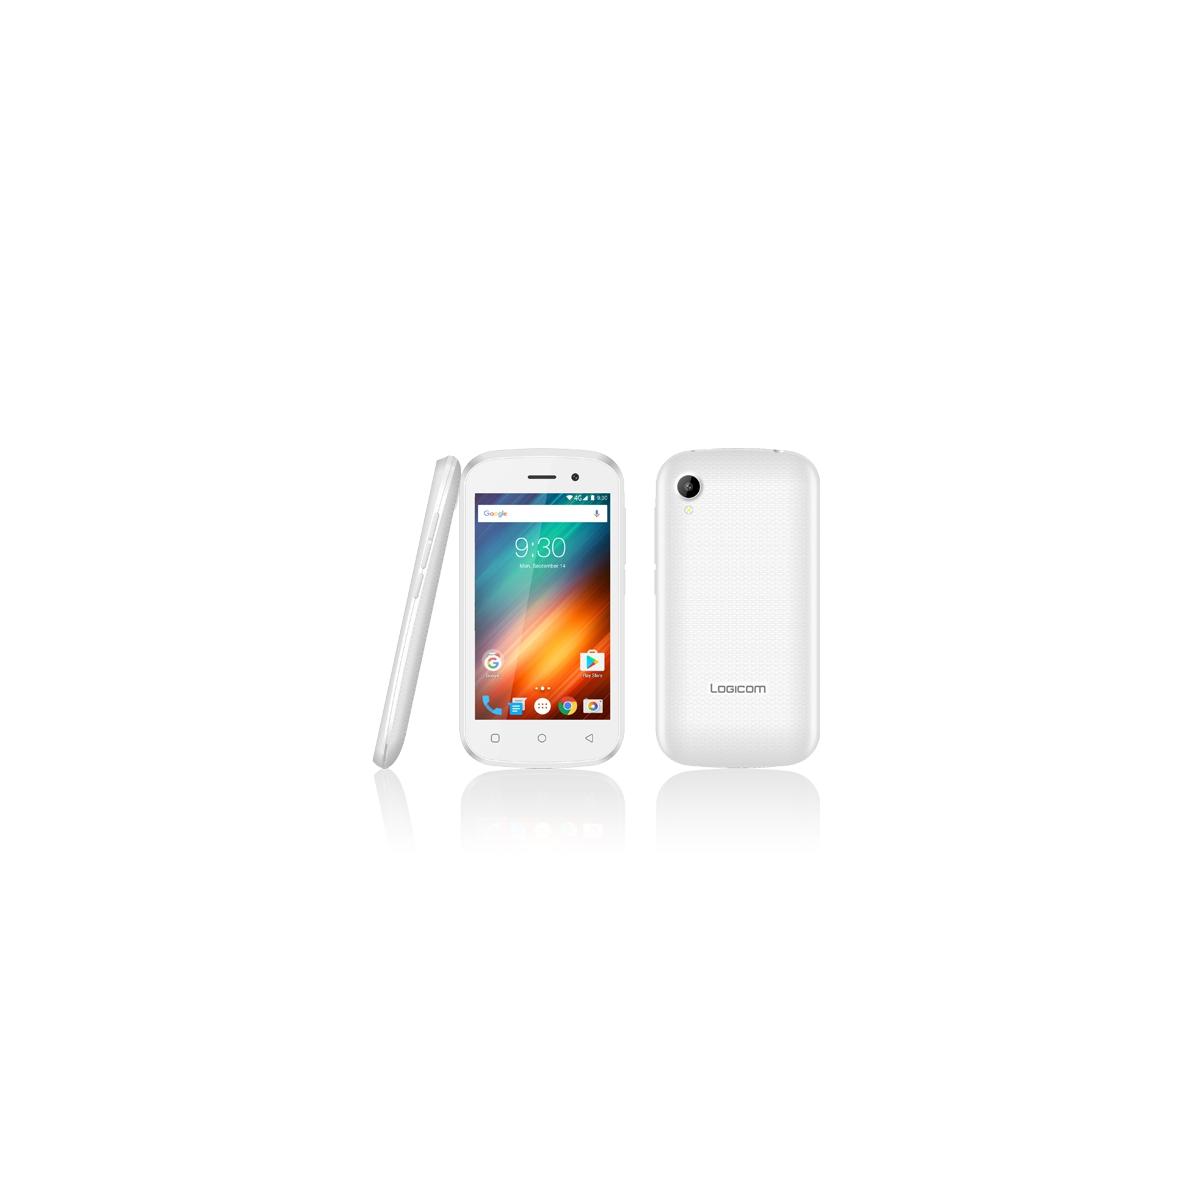 t l phonie smartphone 4 39 39 quadcore 4go google play l ite 400m produits smartphone logicom. Black Bedroom Furniture Sets. Home Design Ideas